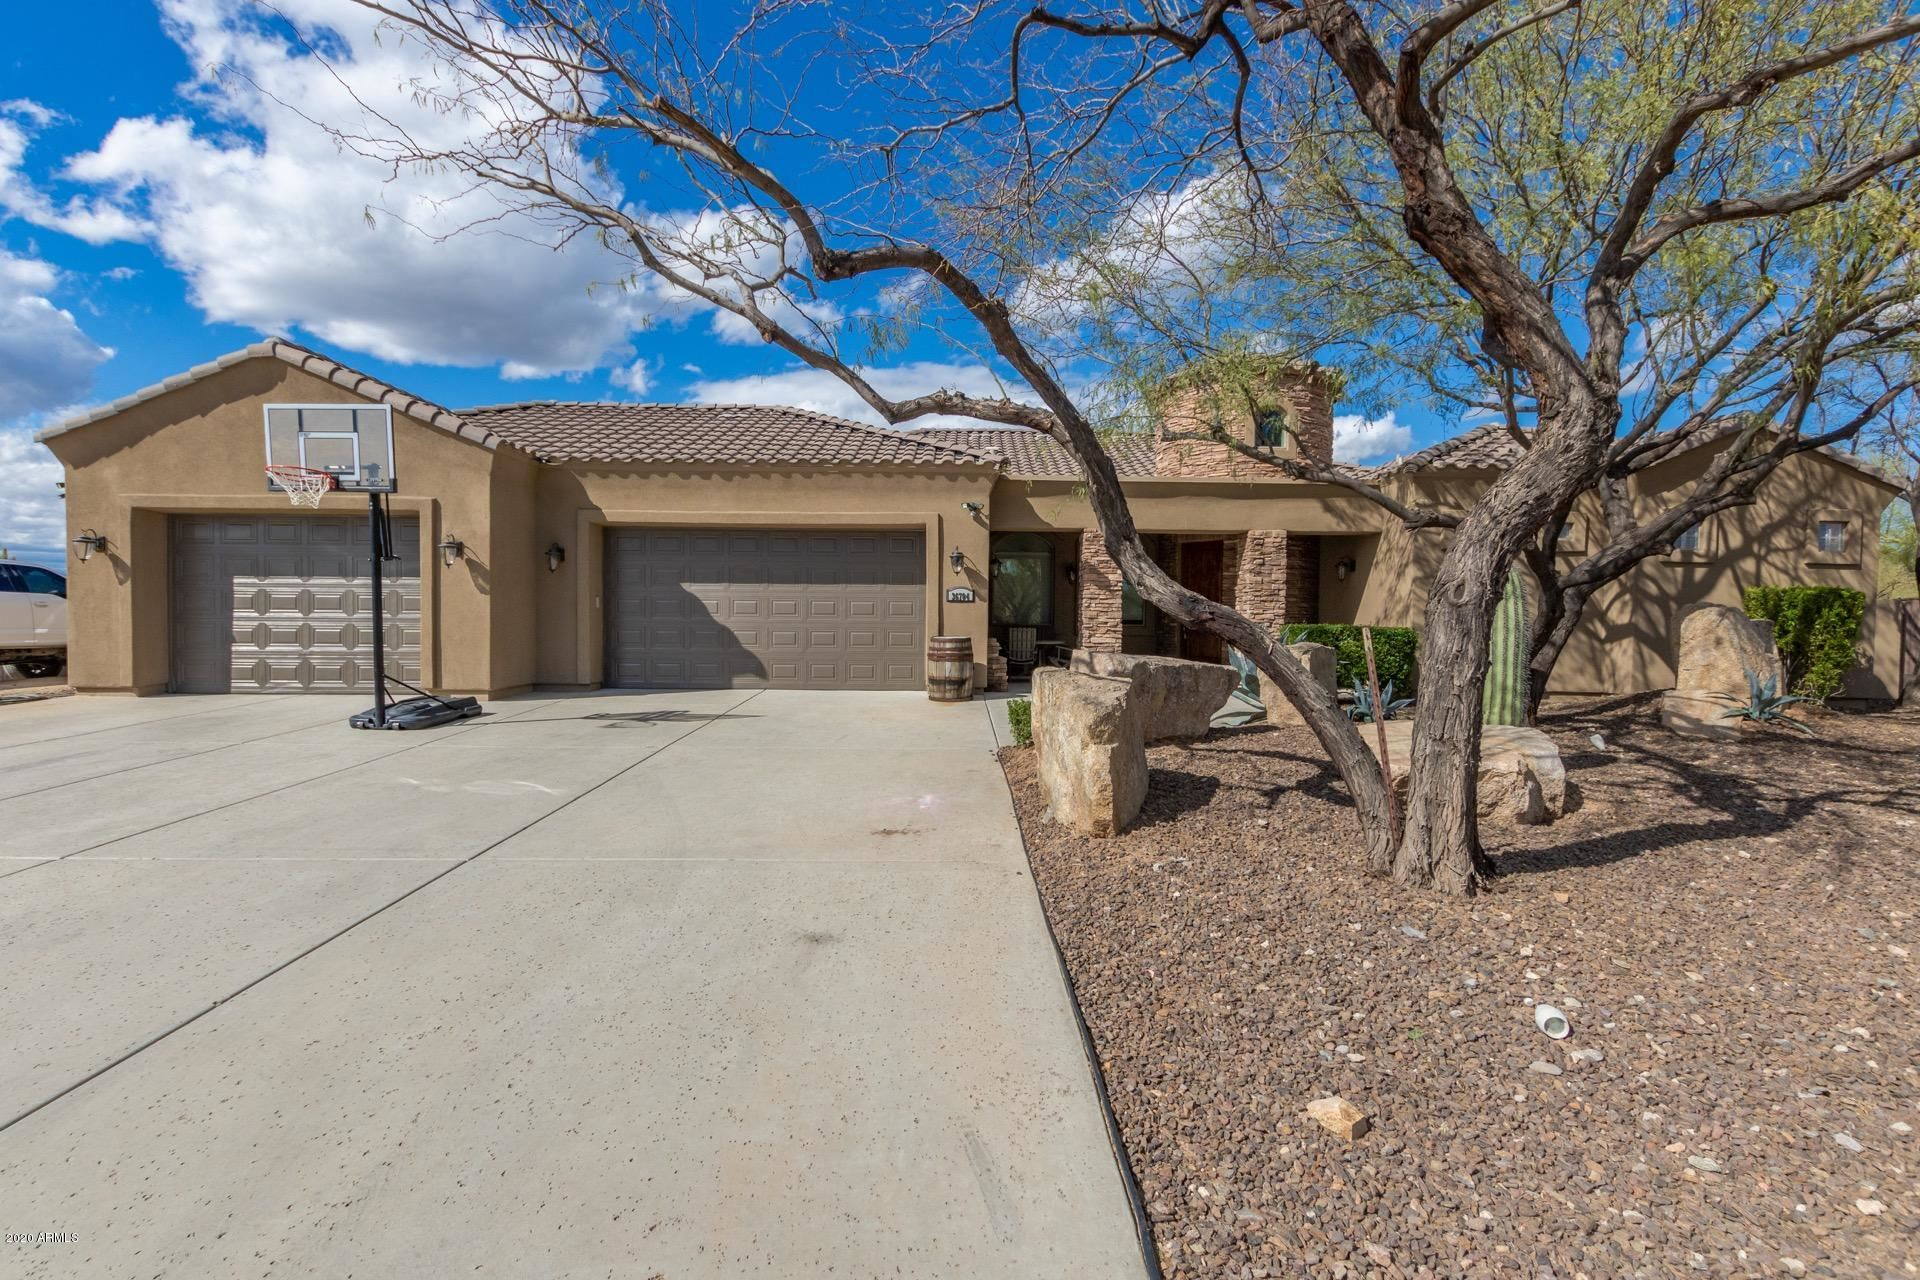 36704 N 28TH Street, Cave Creek, AZ 85331 - #: 6058815